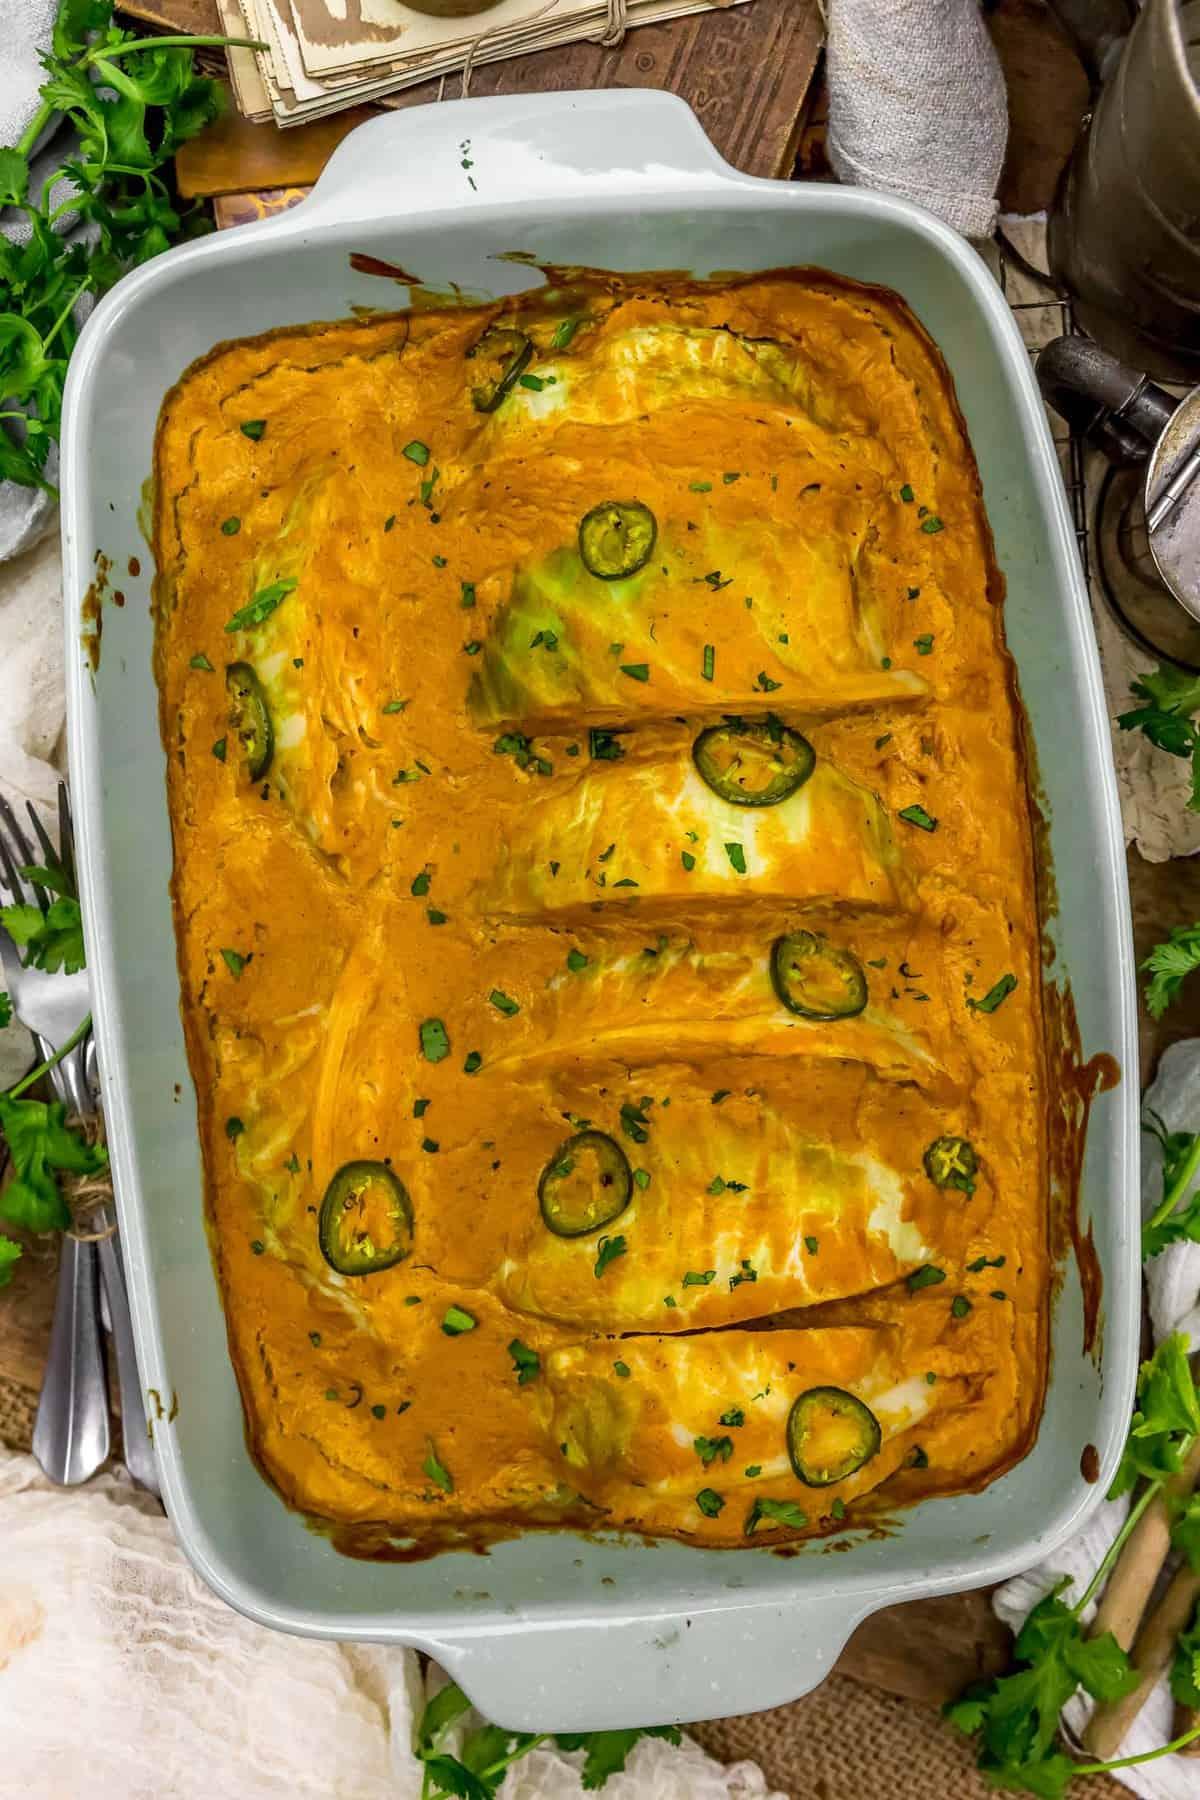 Vegan Southwestern Scalloped Cabbage in a casserole dish